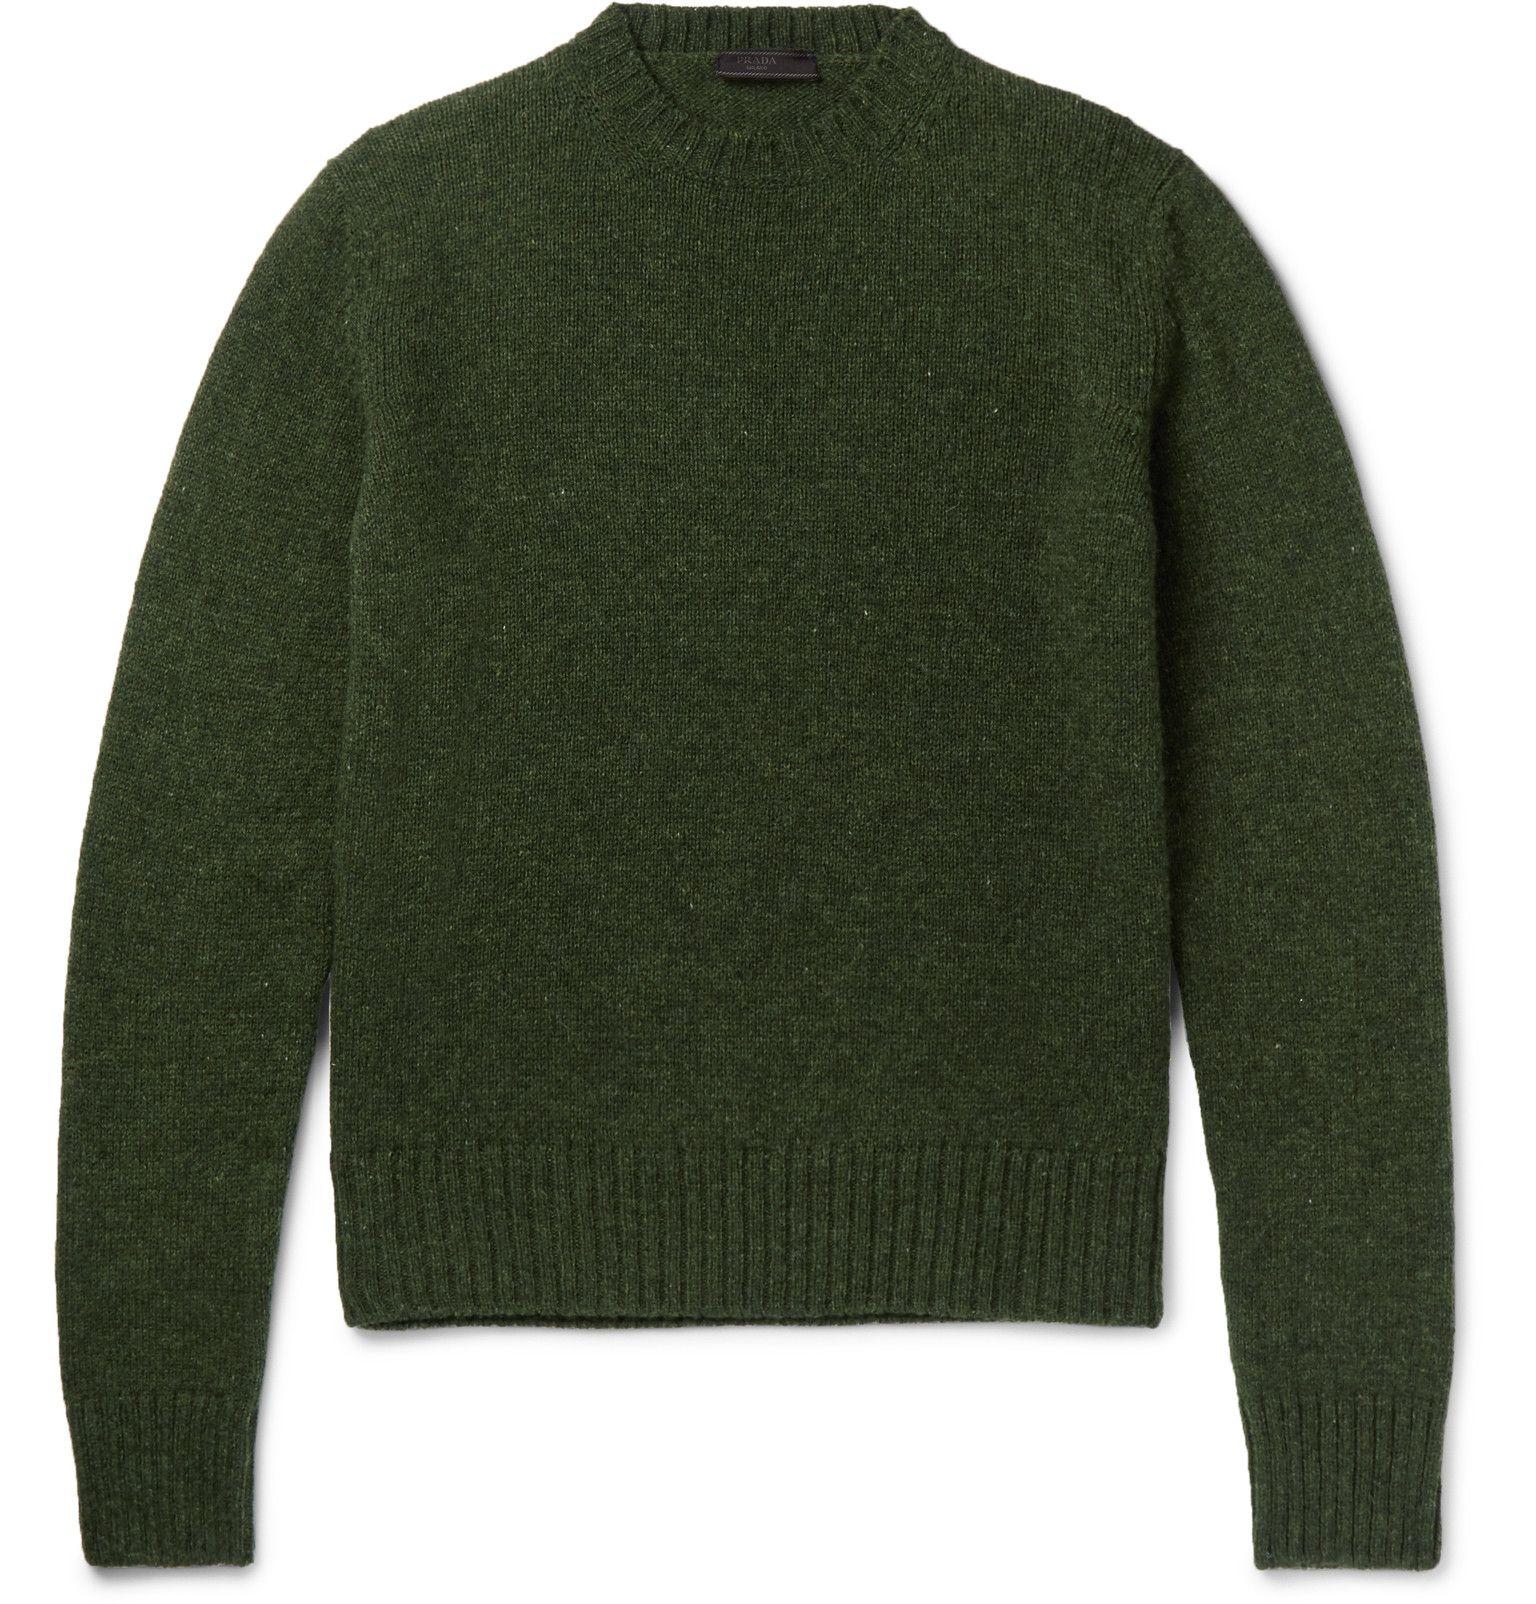 Womens Harley of Scotland Shetland Wool Sweater | My Style - Cold ...